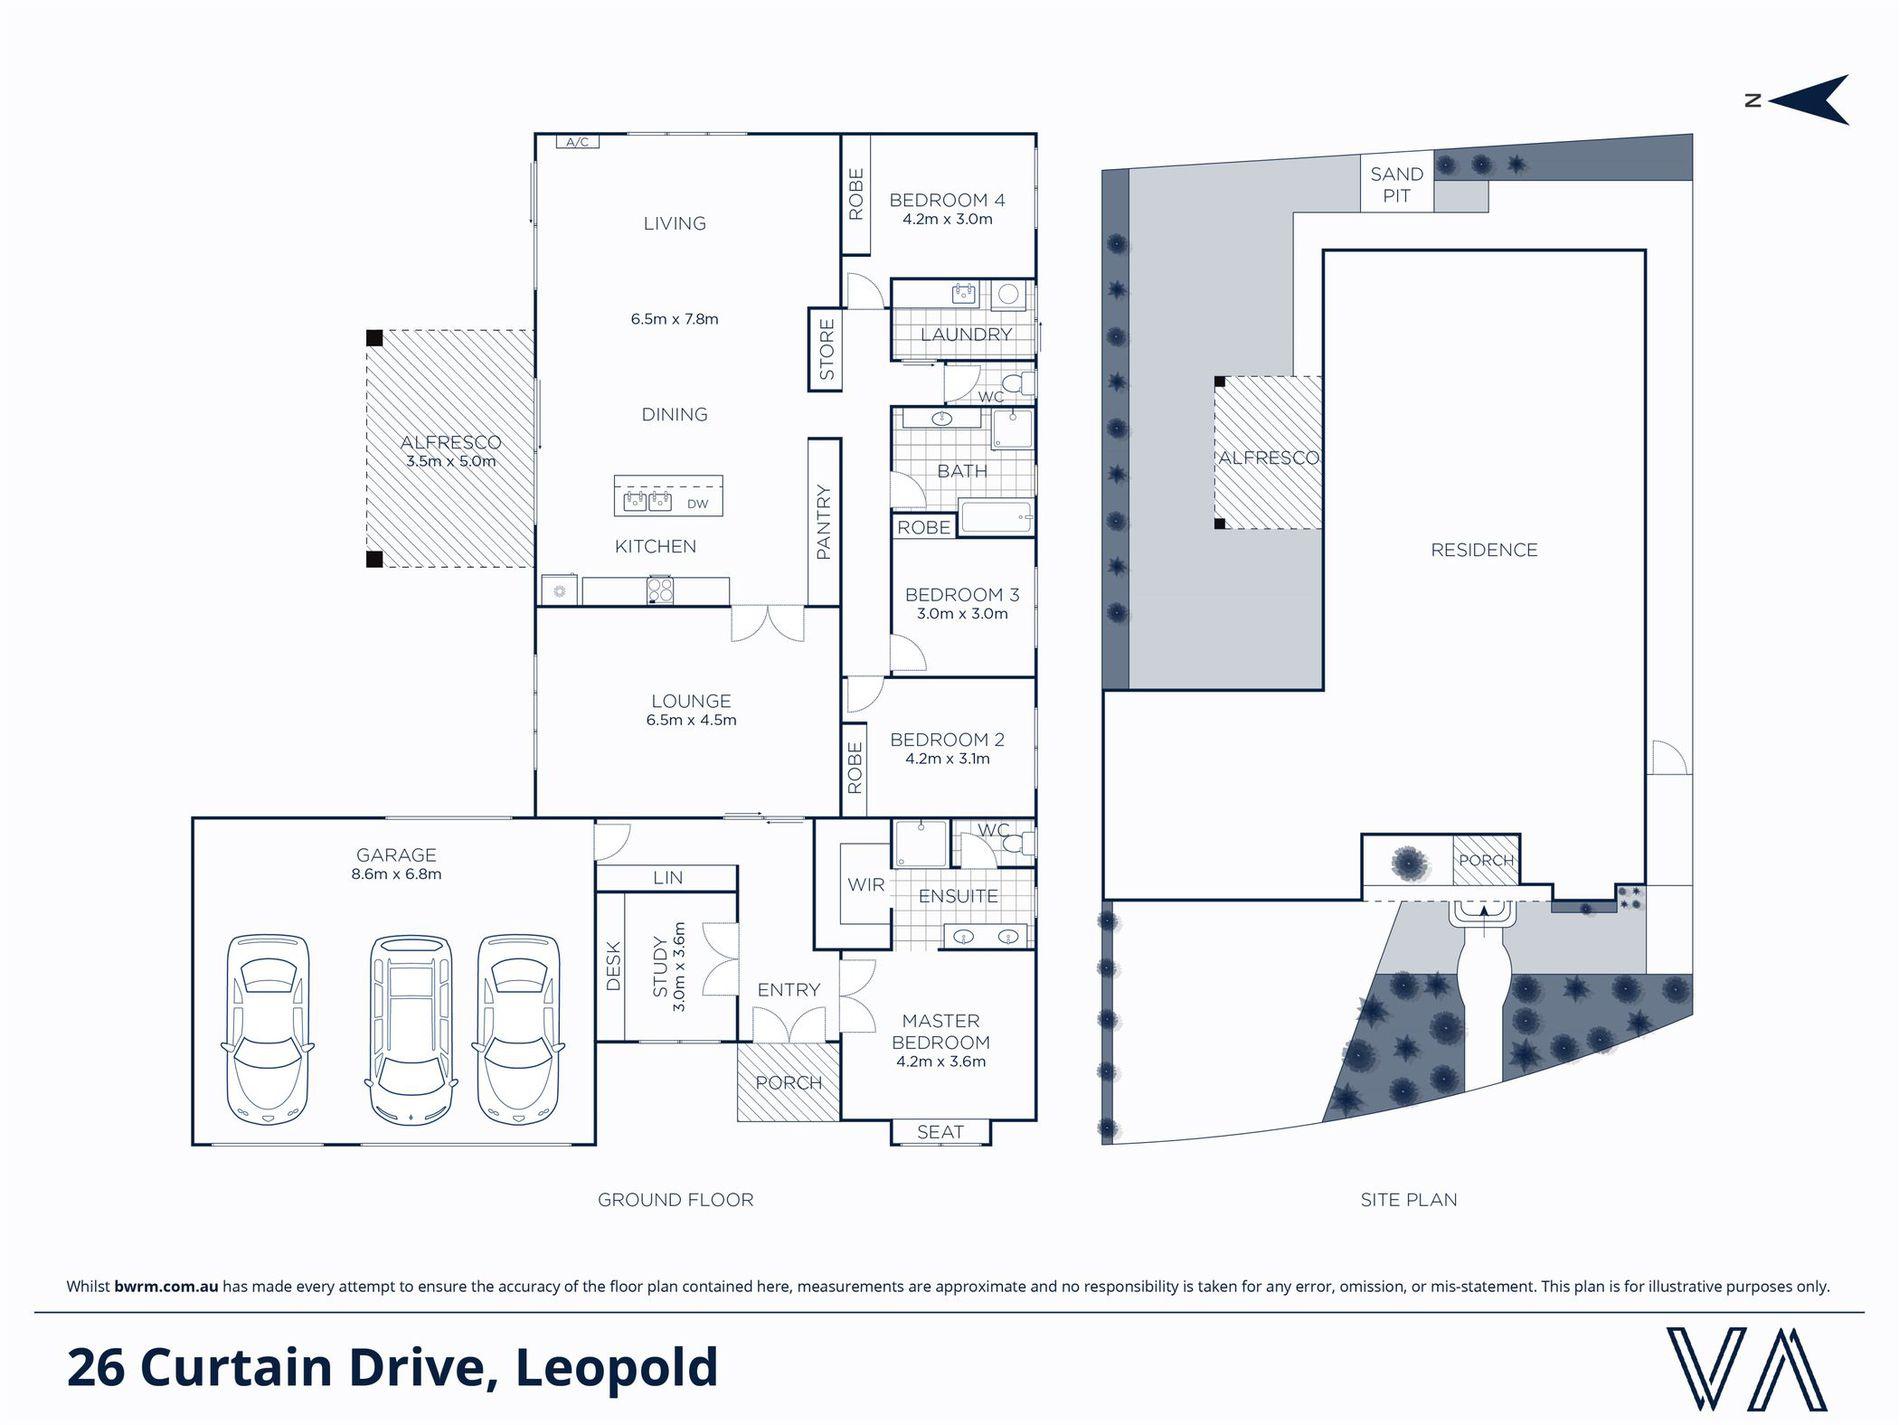 26 Curtain Drive, Leopold